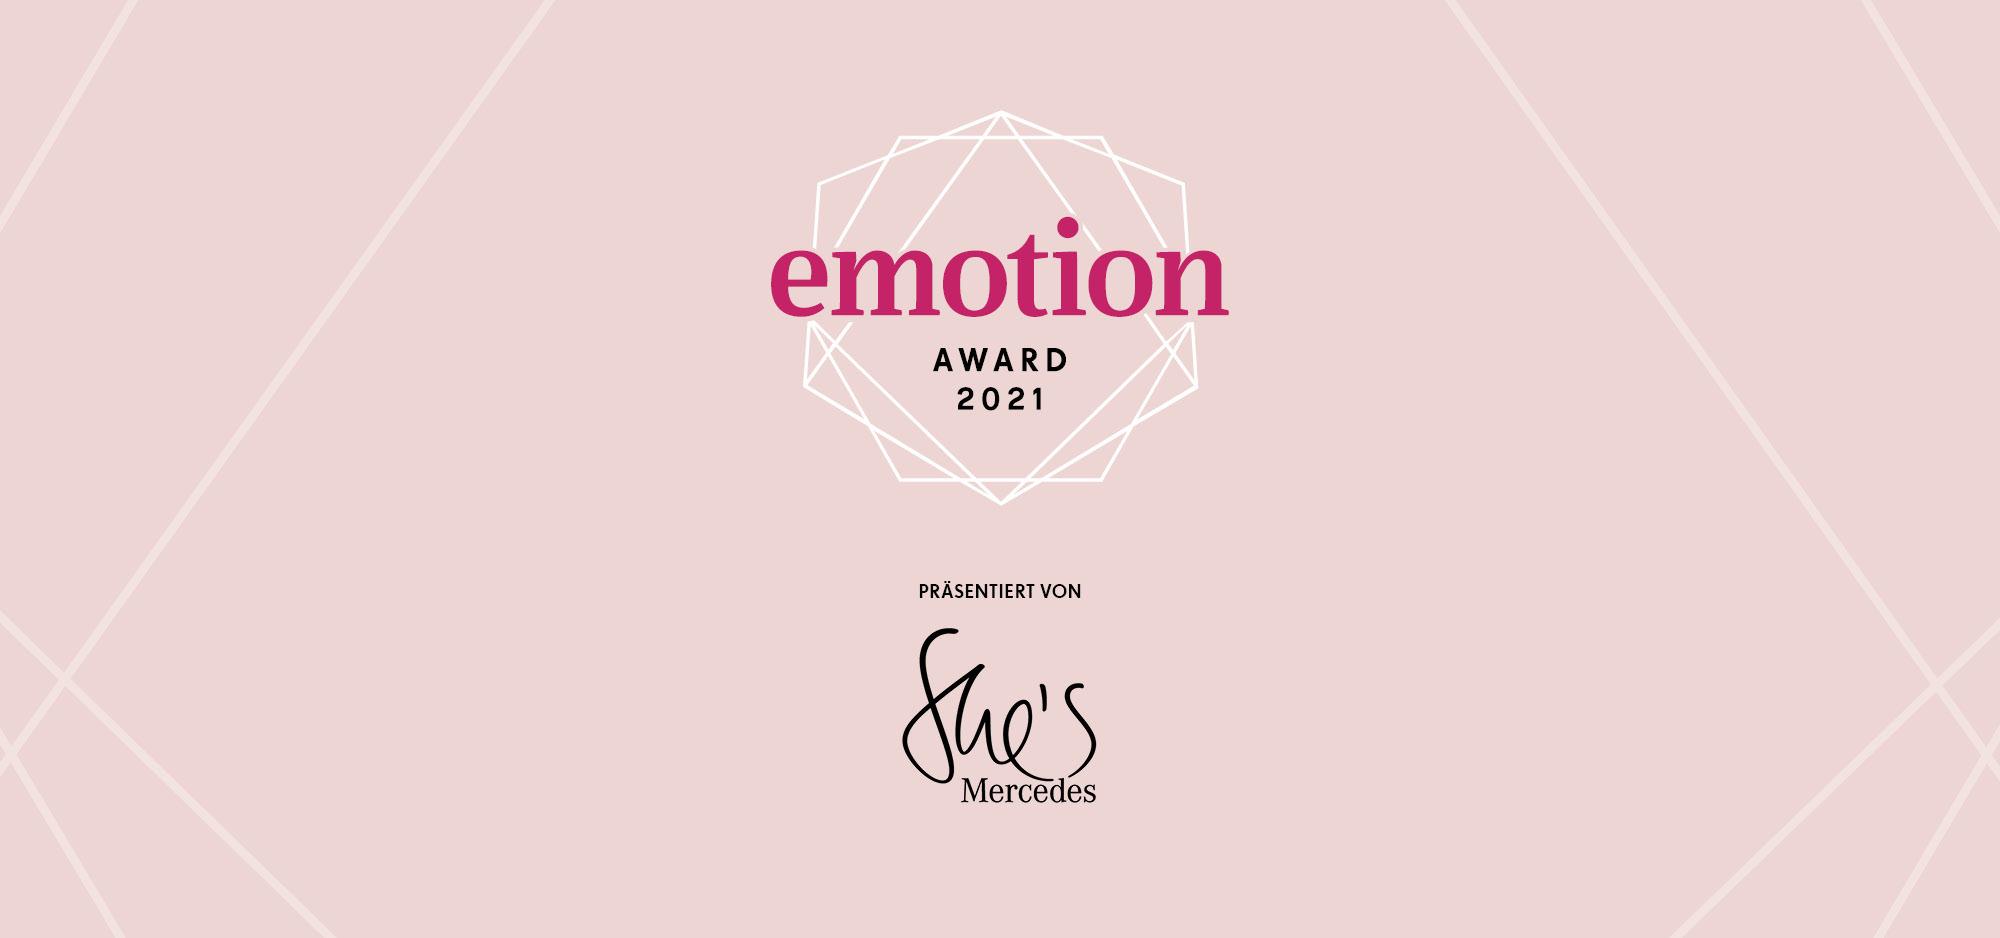 EMOTION.award 2021